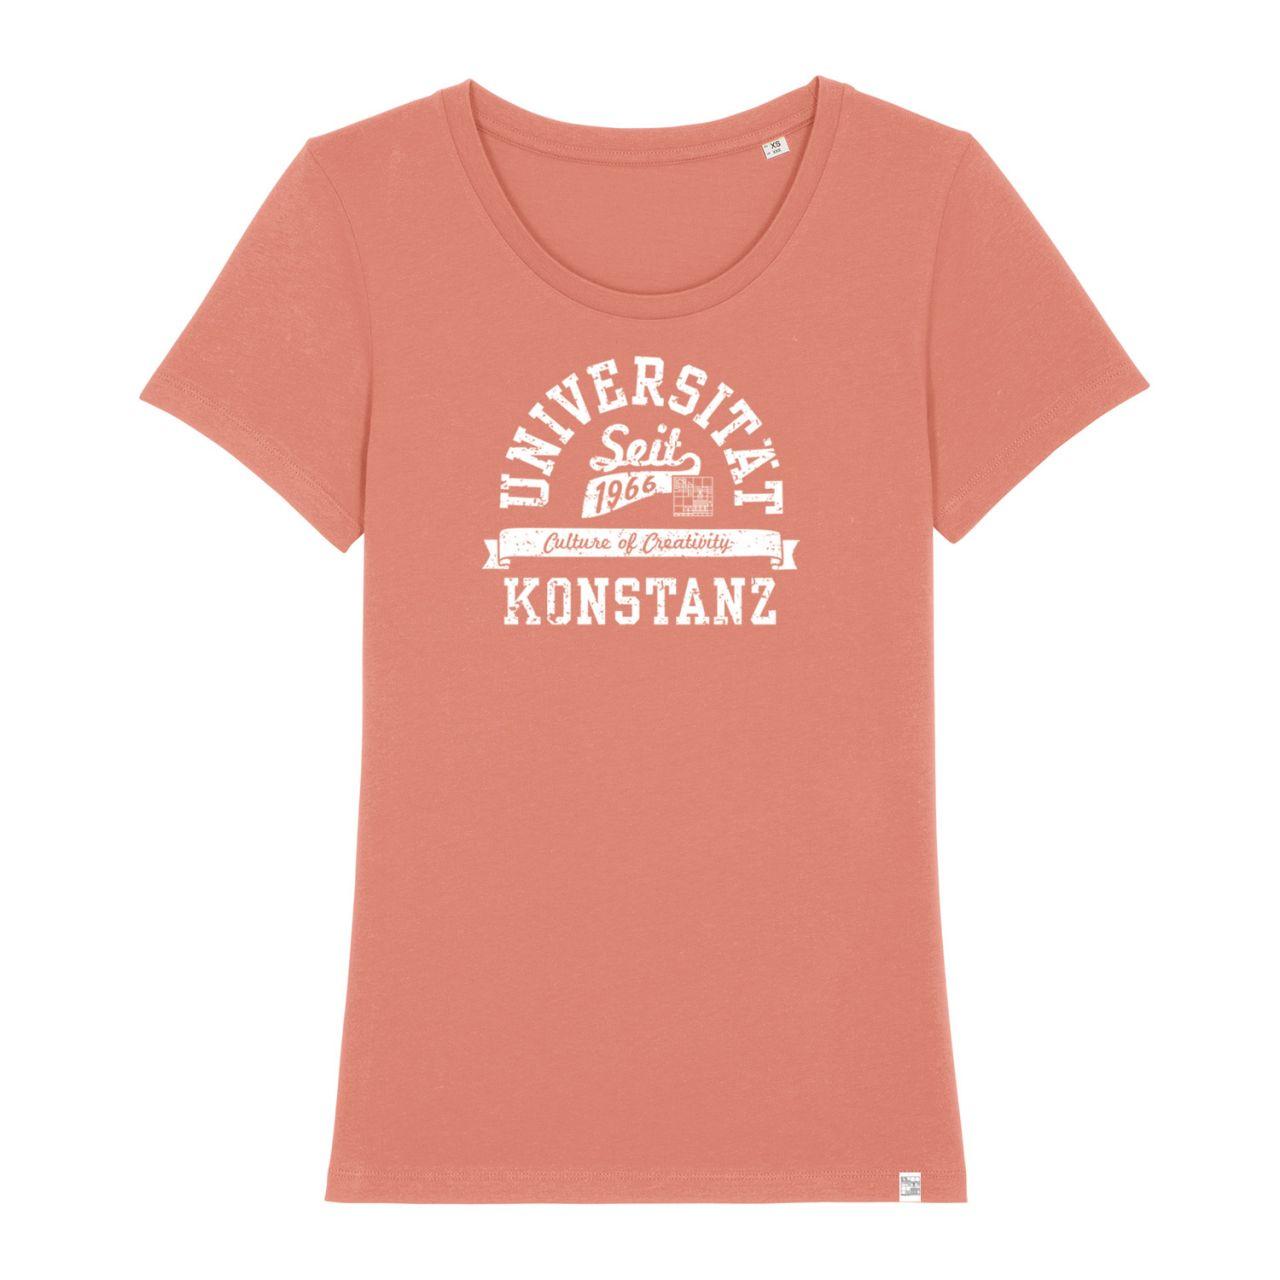 Damen Organic T-Shirt, rose, berkley